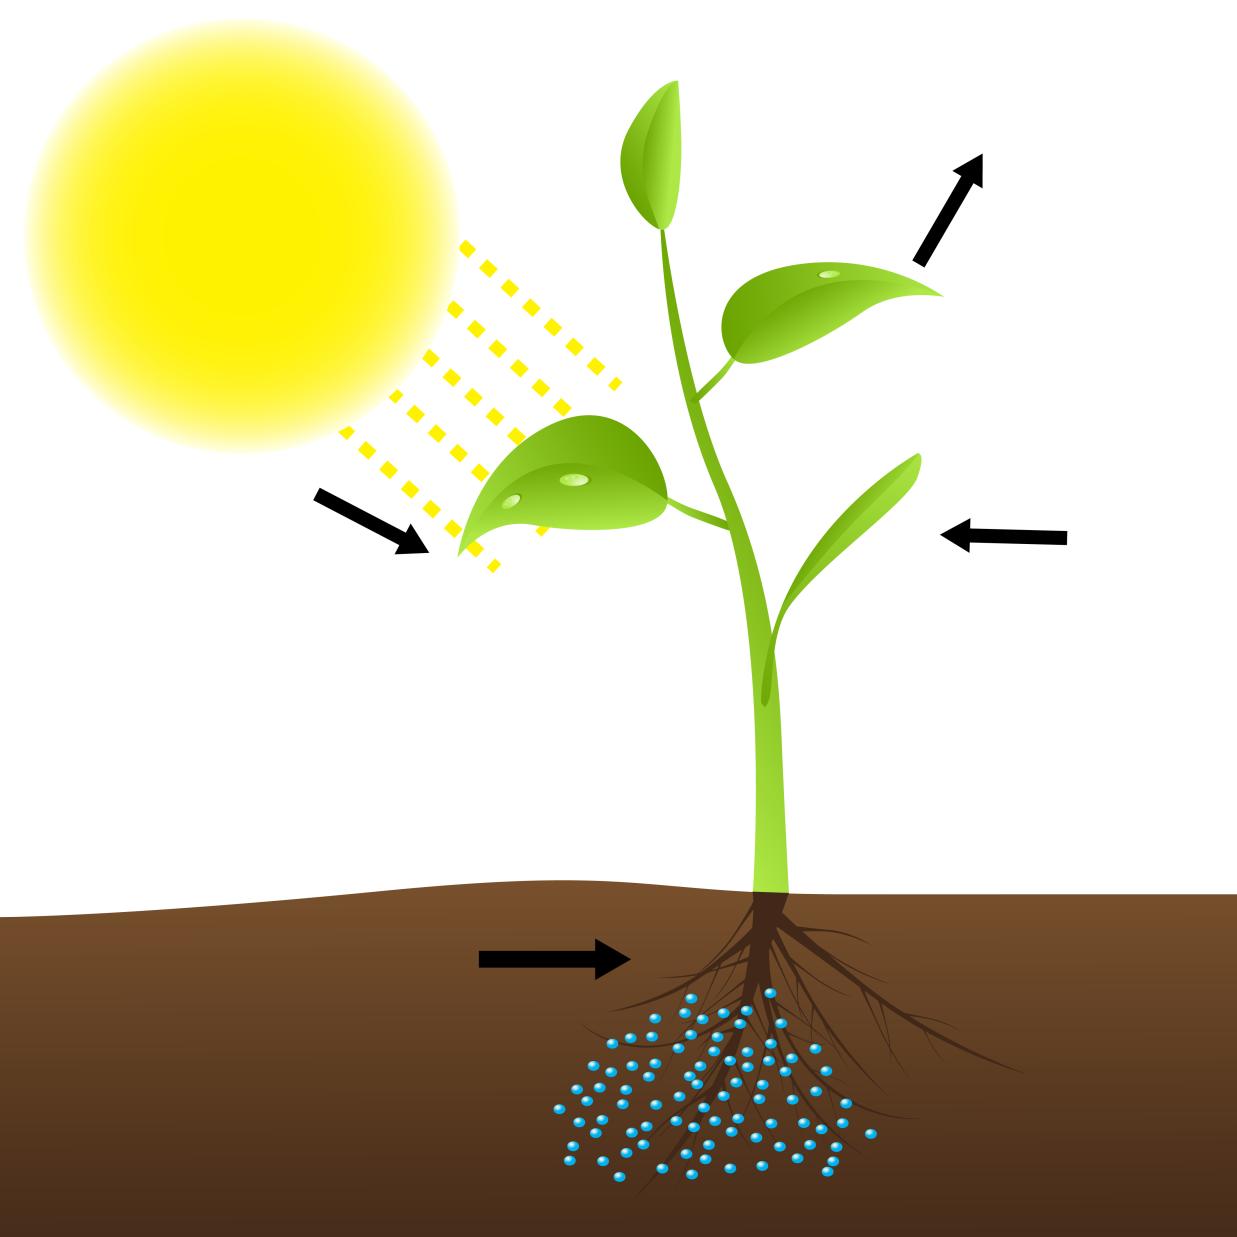 топик по английскому про фотосинтез хочу вам